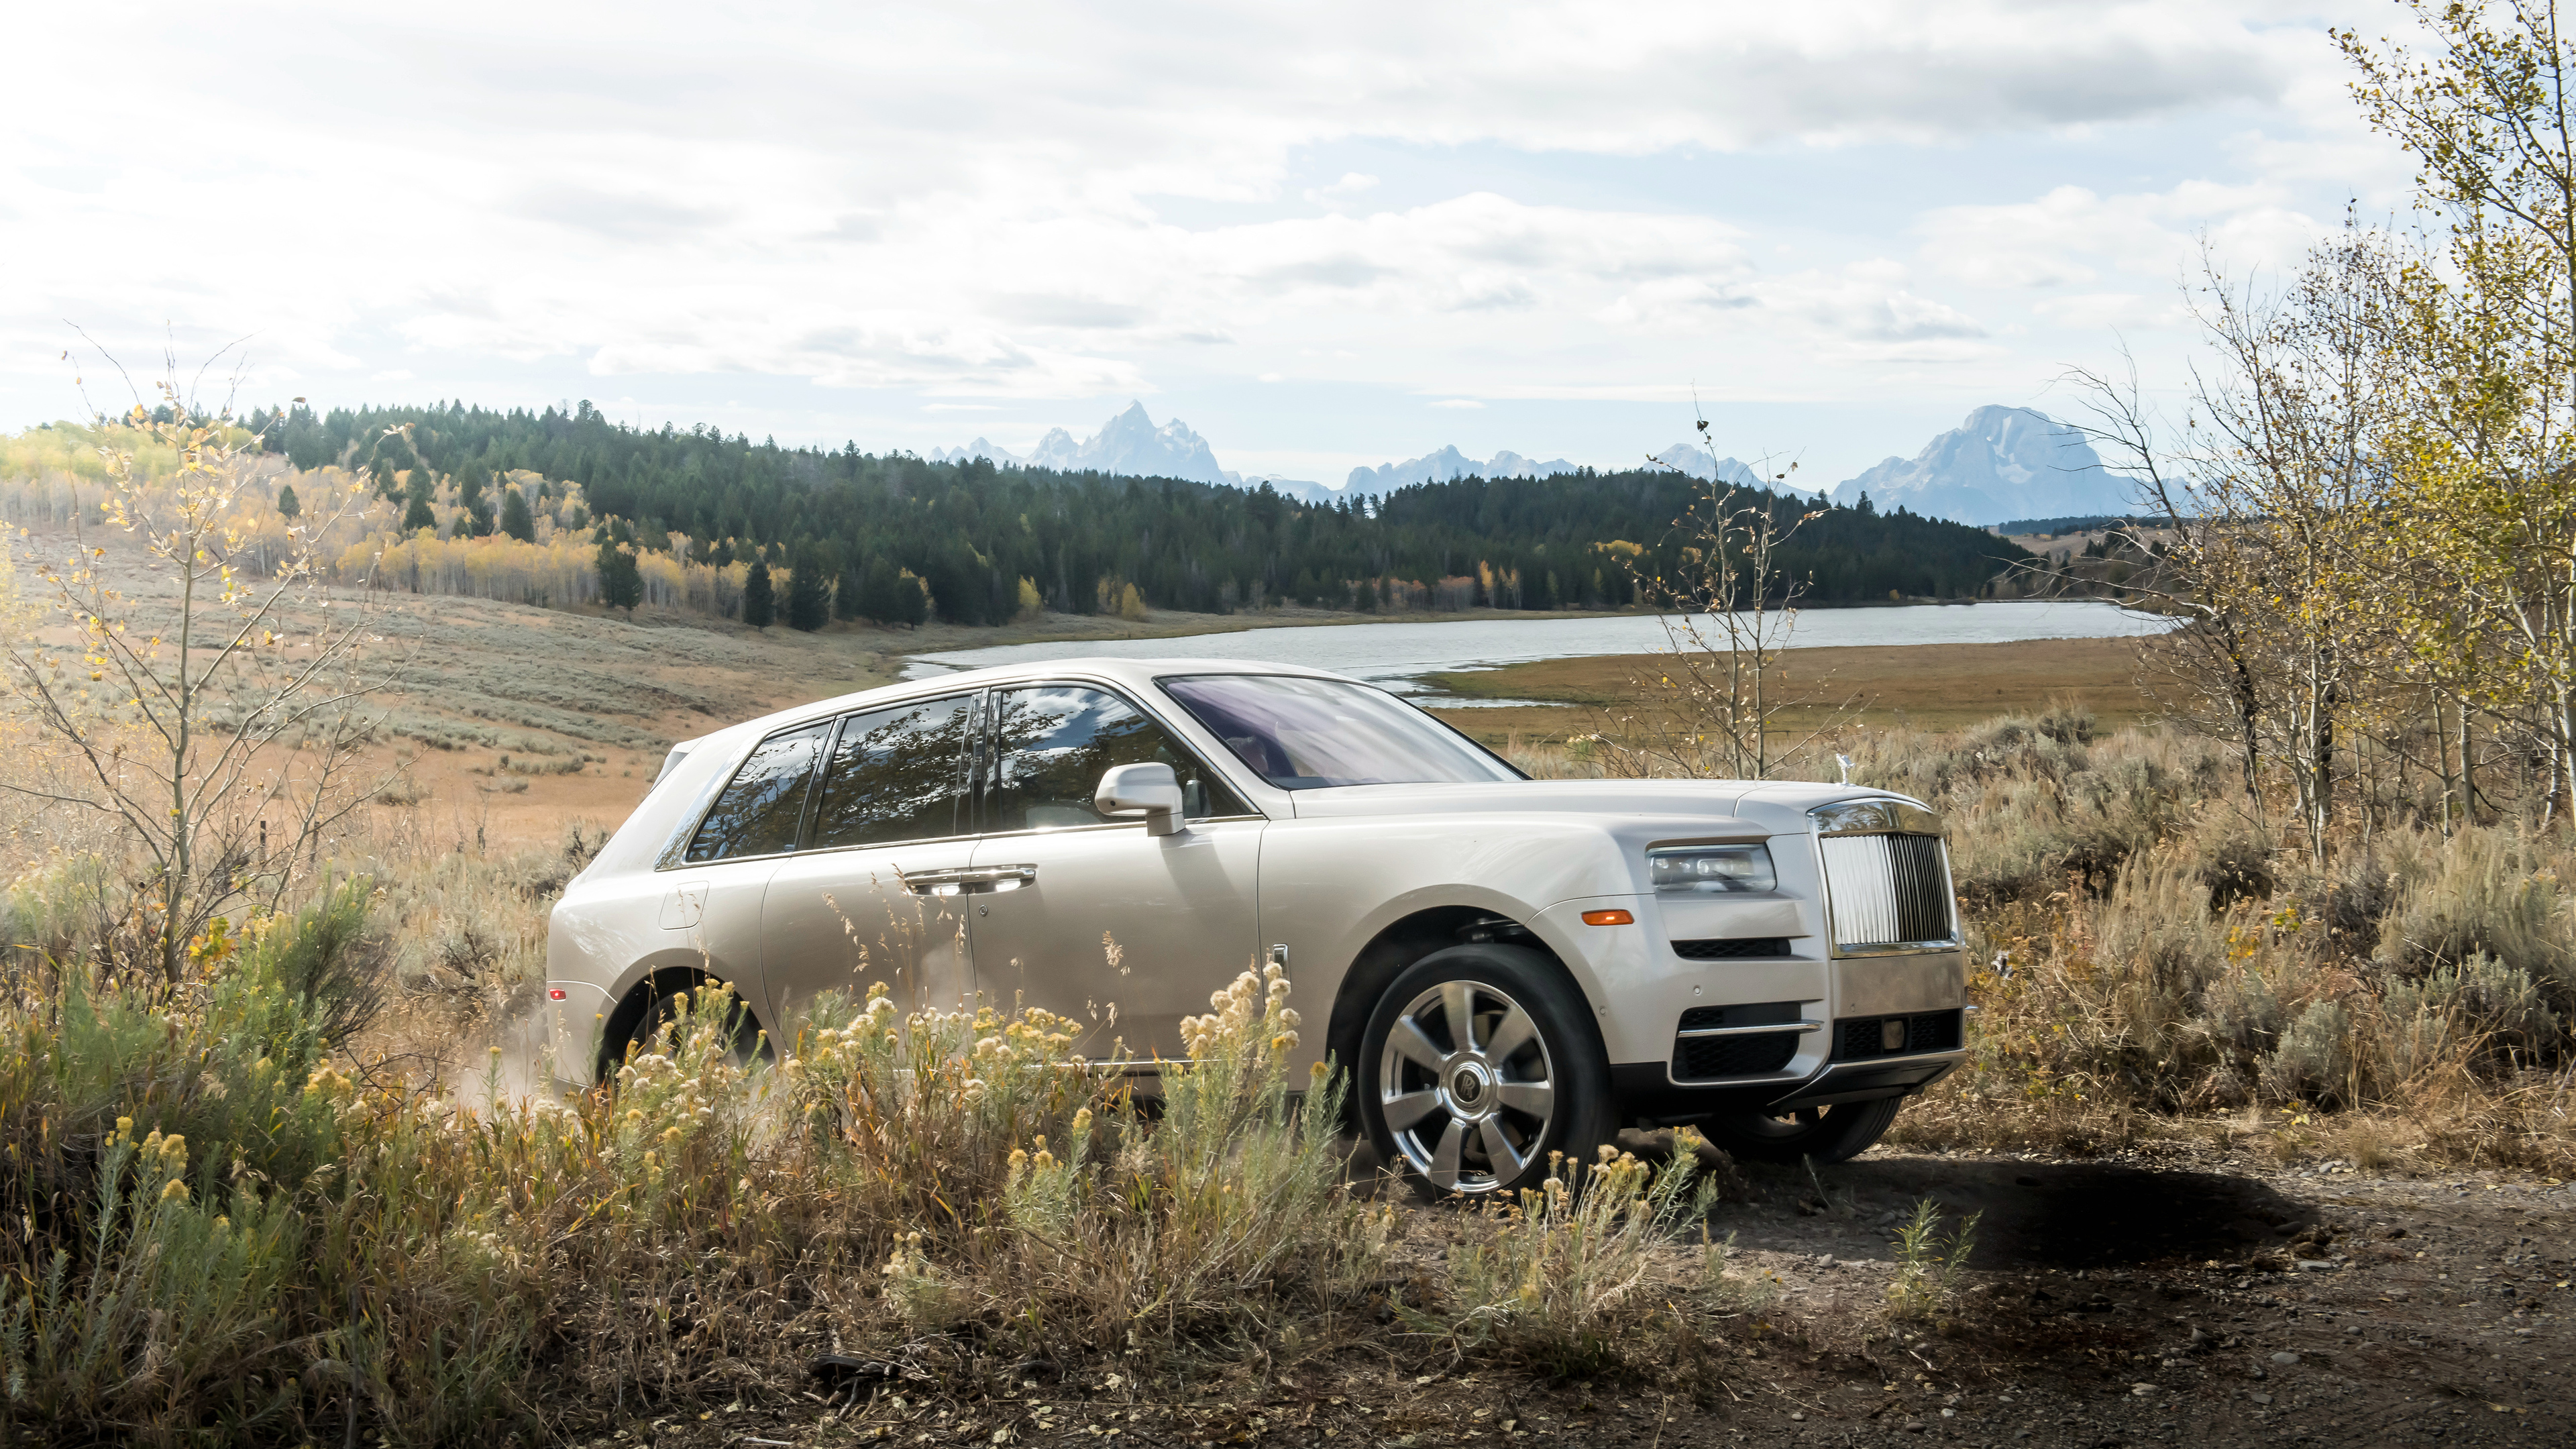 2019 rolls royce suv cullinan 4k 1539792960 - 2019 Rolls Royce SUV Cullinan 4k - rolls royce wallpapers, rolls royce cullinan wallpapers, hd-wallpapers, cars wallpapers, 4k-wallpapers, 2019 cars wallpapers